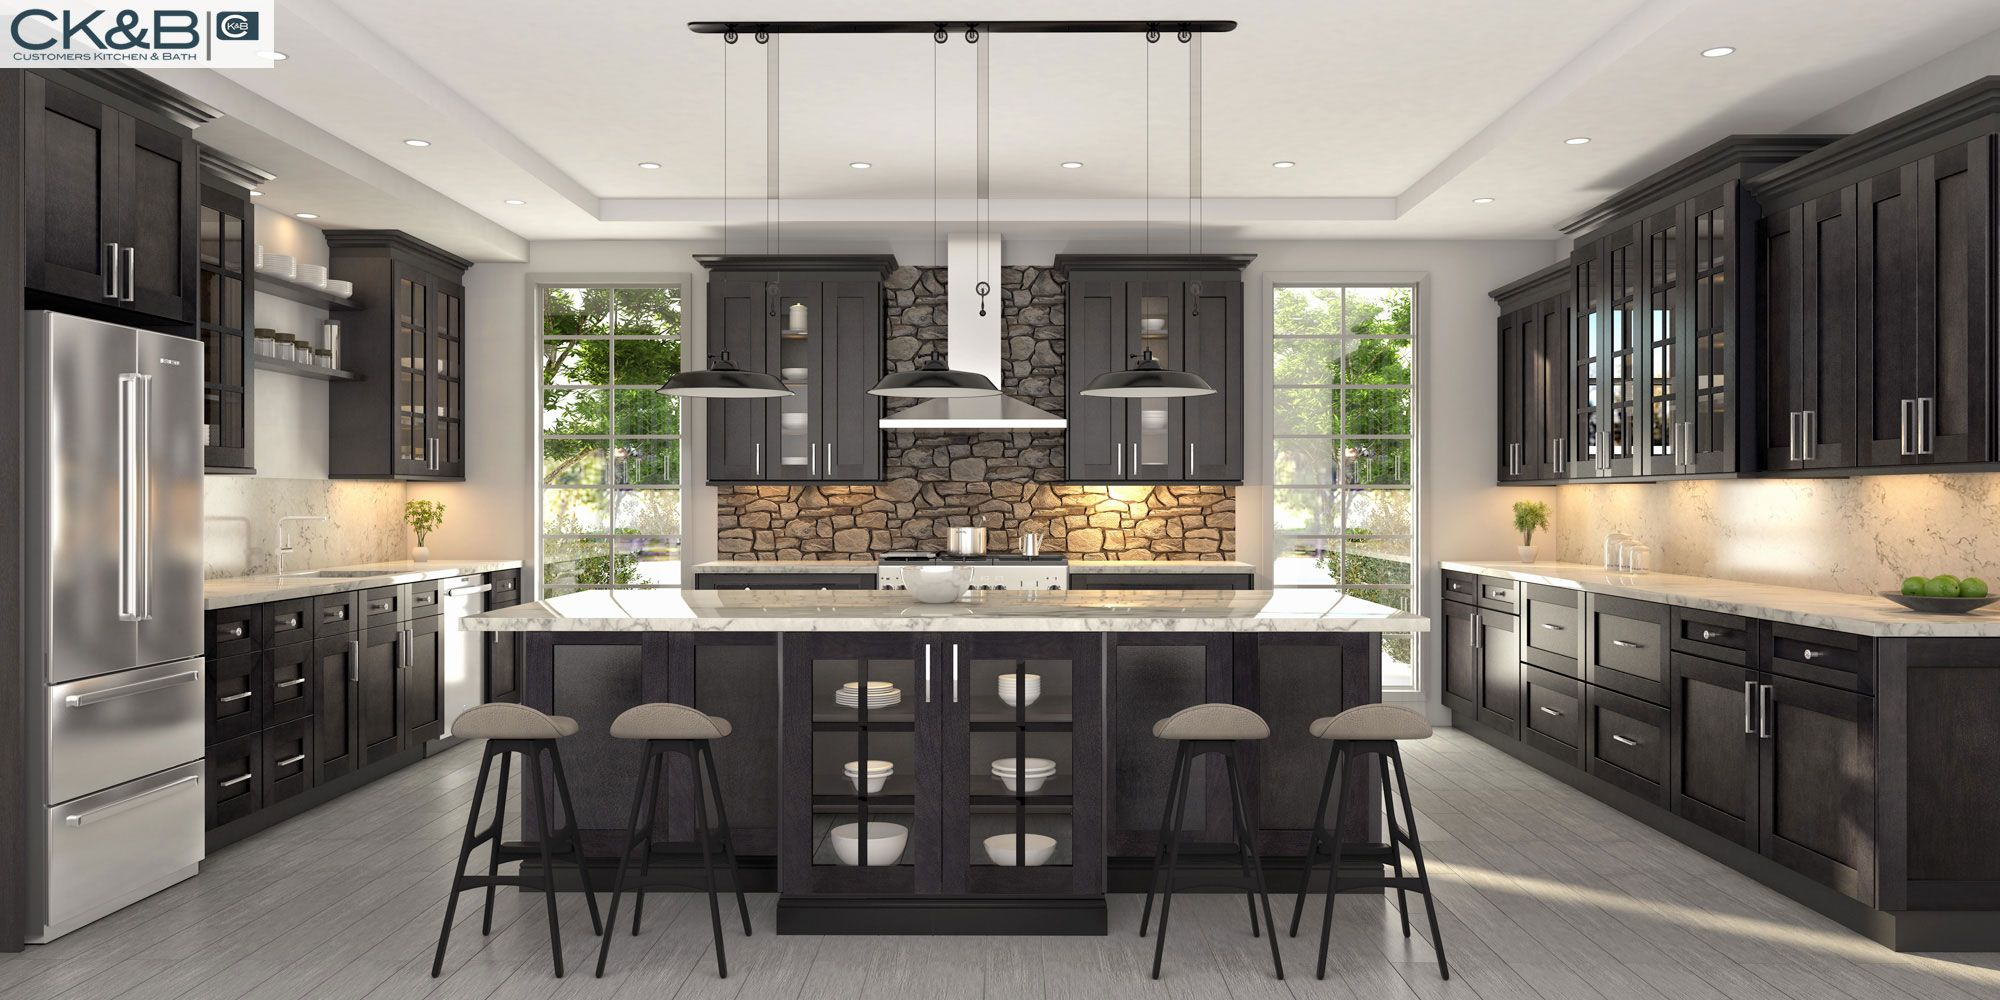 Family kitchen design cambriausa kitchen remodel kitchenremodel